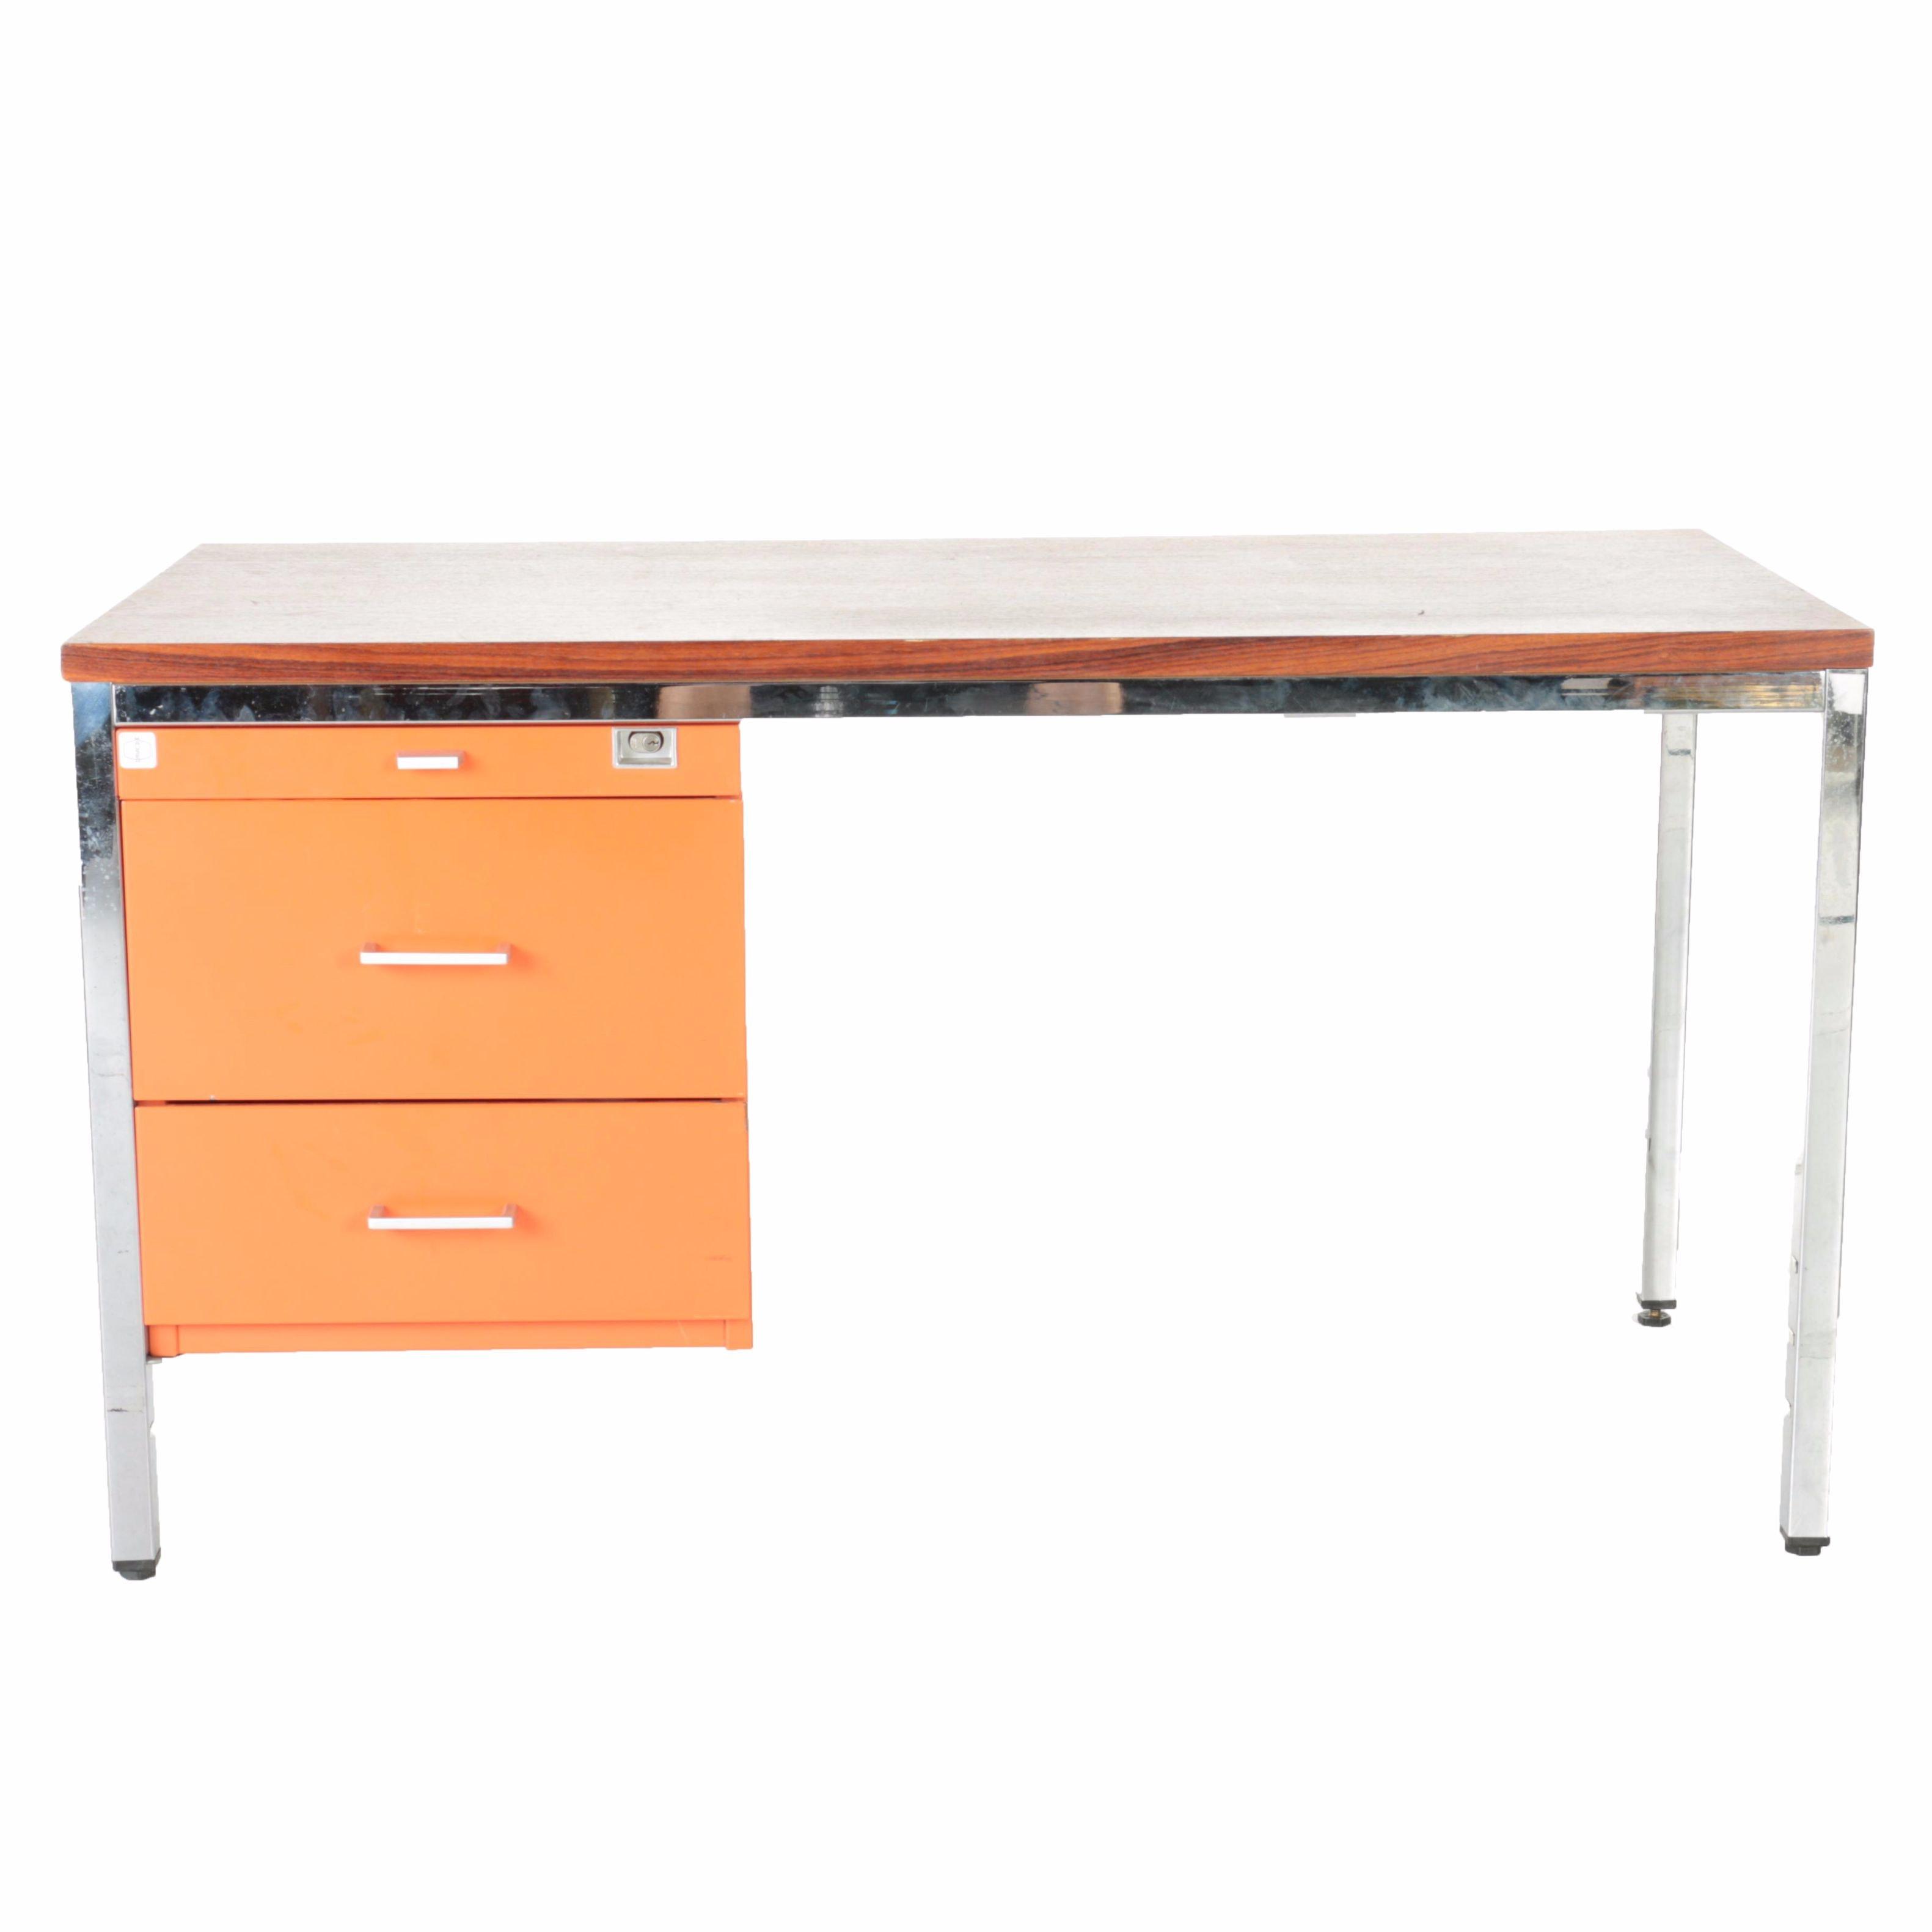 Important Mid Century Modern Desk Designed by Marcel Breuer for Mauser Werke